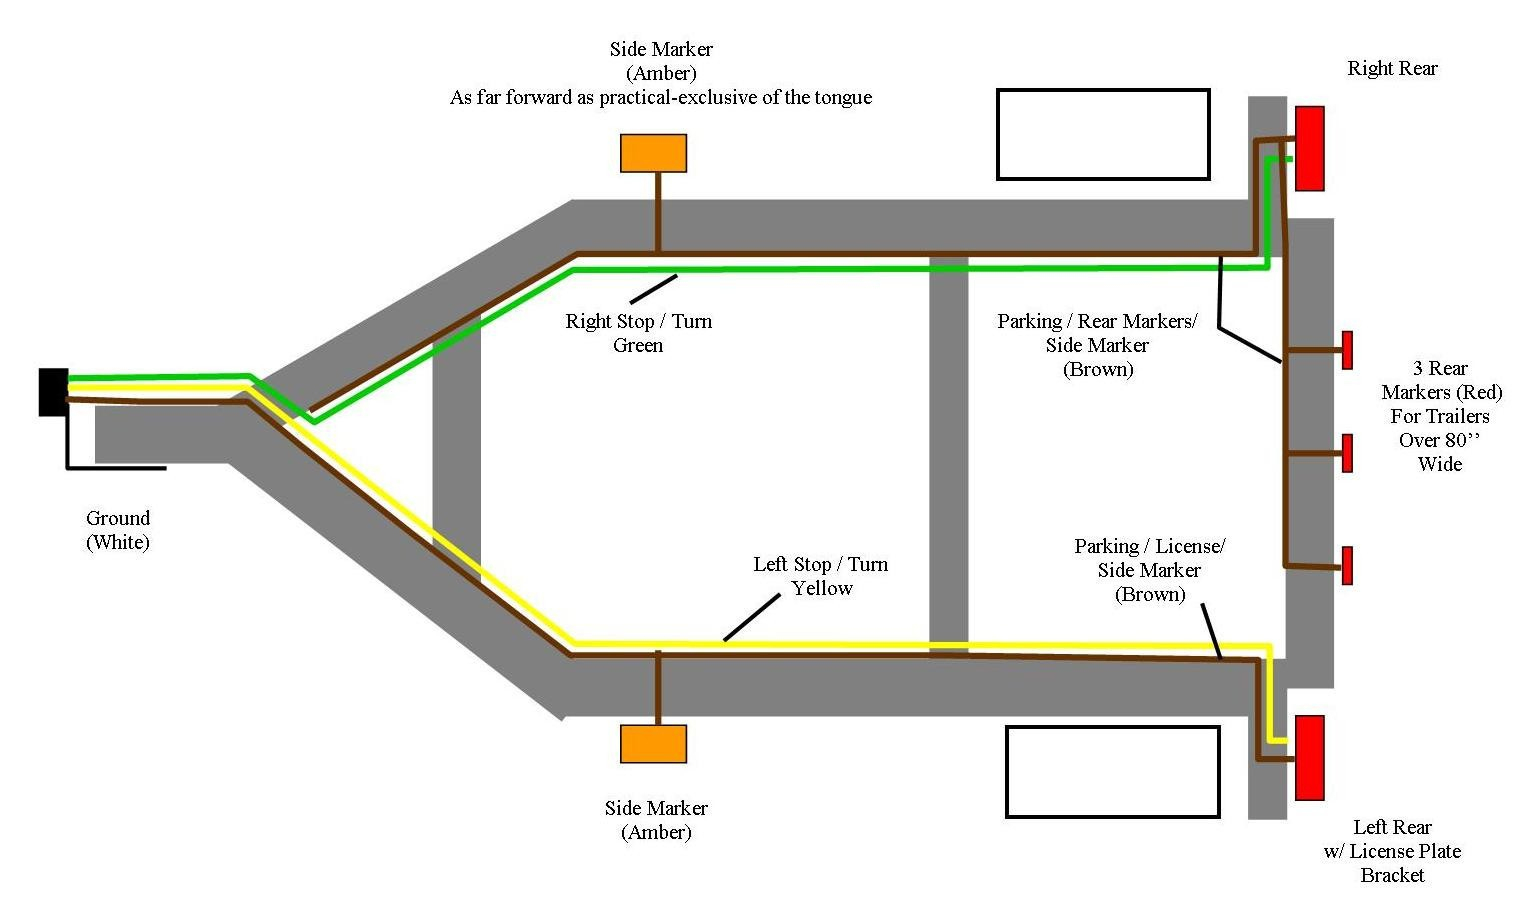 Boat Lights Wiring Diagram - Wiring Diagram Data Oreo - Boat Trailer Lights Wiring Diagram